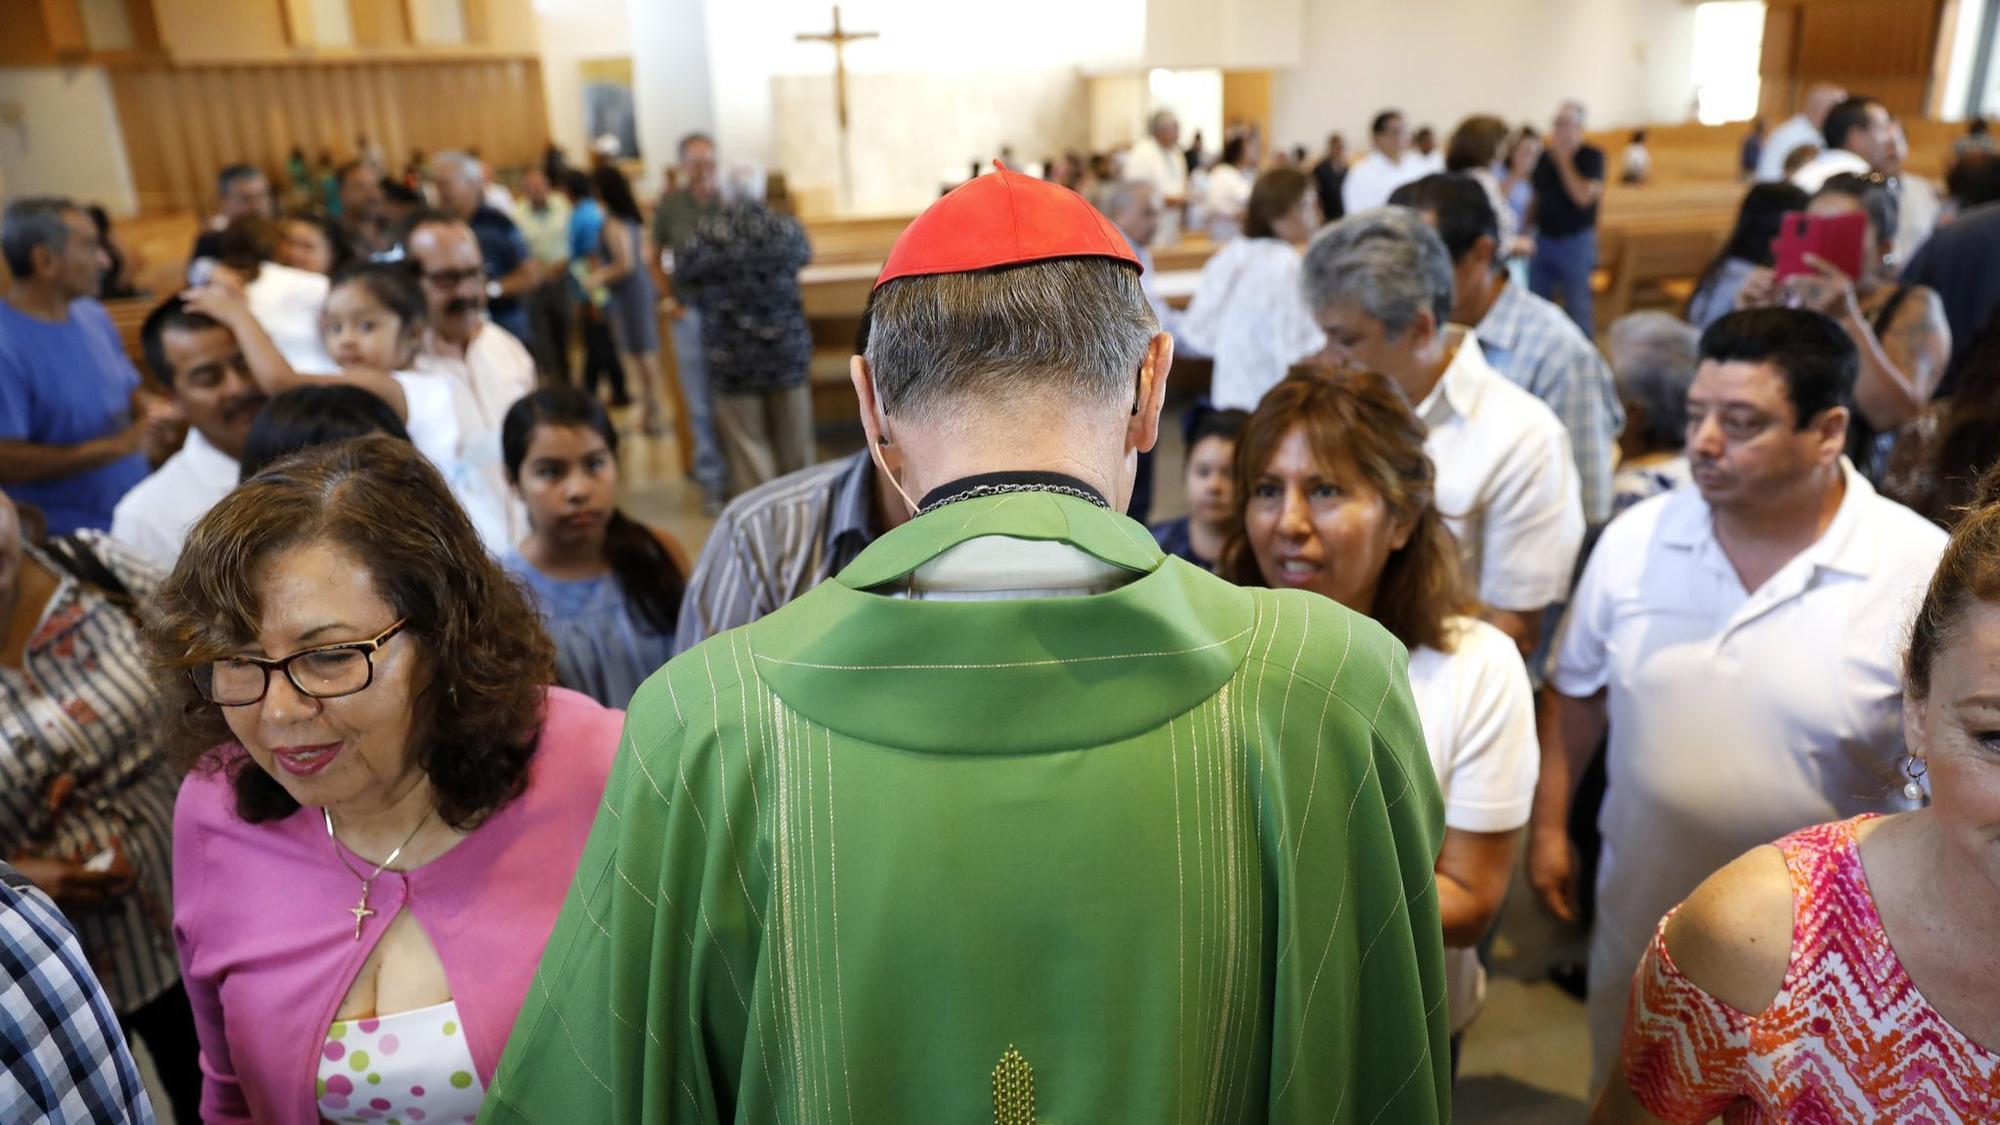 HACIENDA HEIGHTS-CA-JULY 8, 2018: Cardinal Mahony greets parishioners after leading mass in Spanish